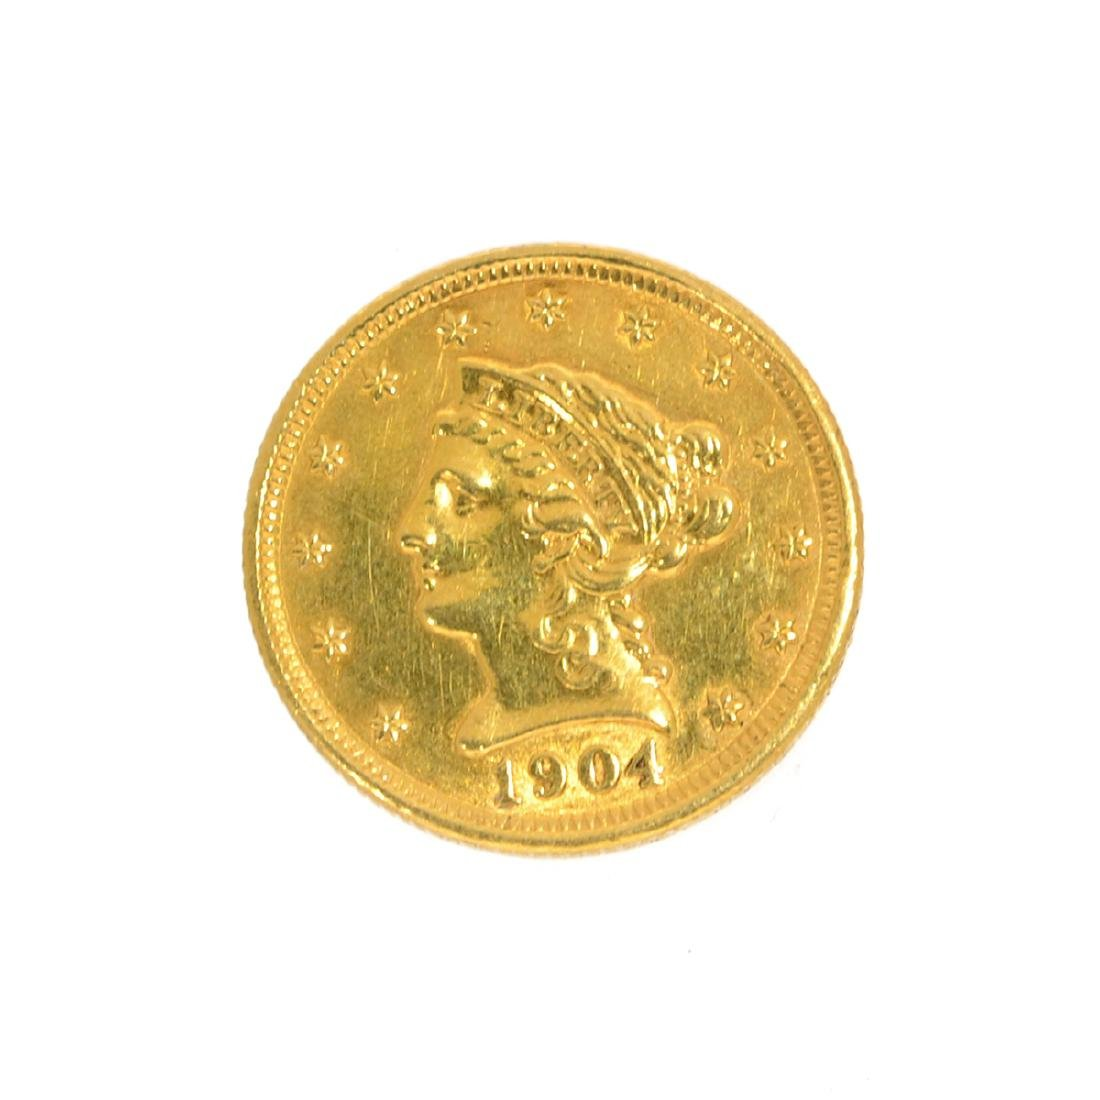 *1904 $2.5 U.S. Liberty Head Gold Coin (DF)